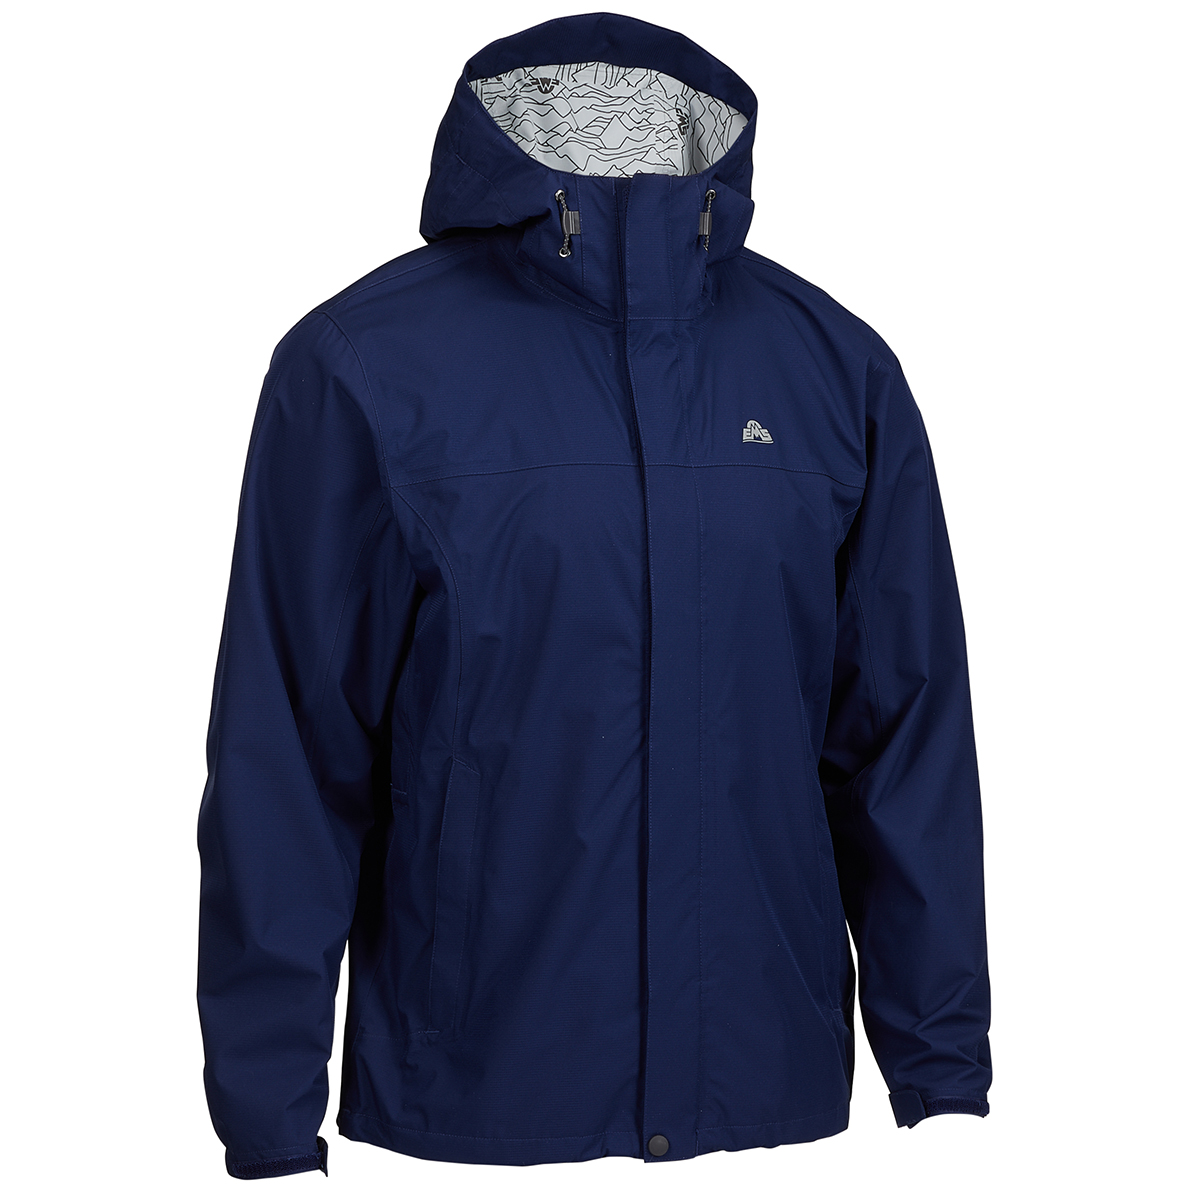 Ems Men's Thunderhead Peak Rain Jacket - Blue, S